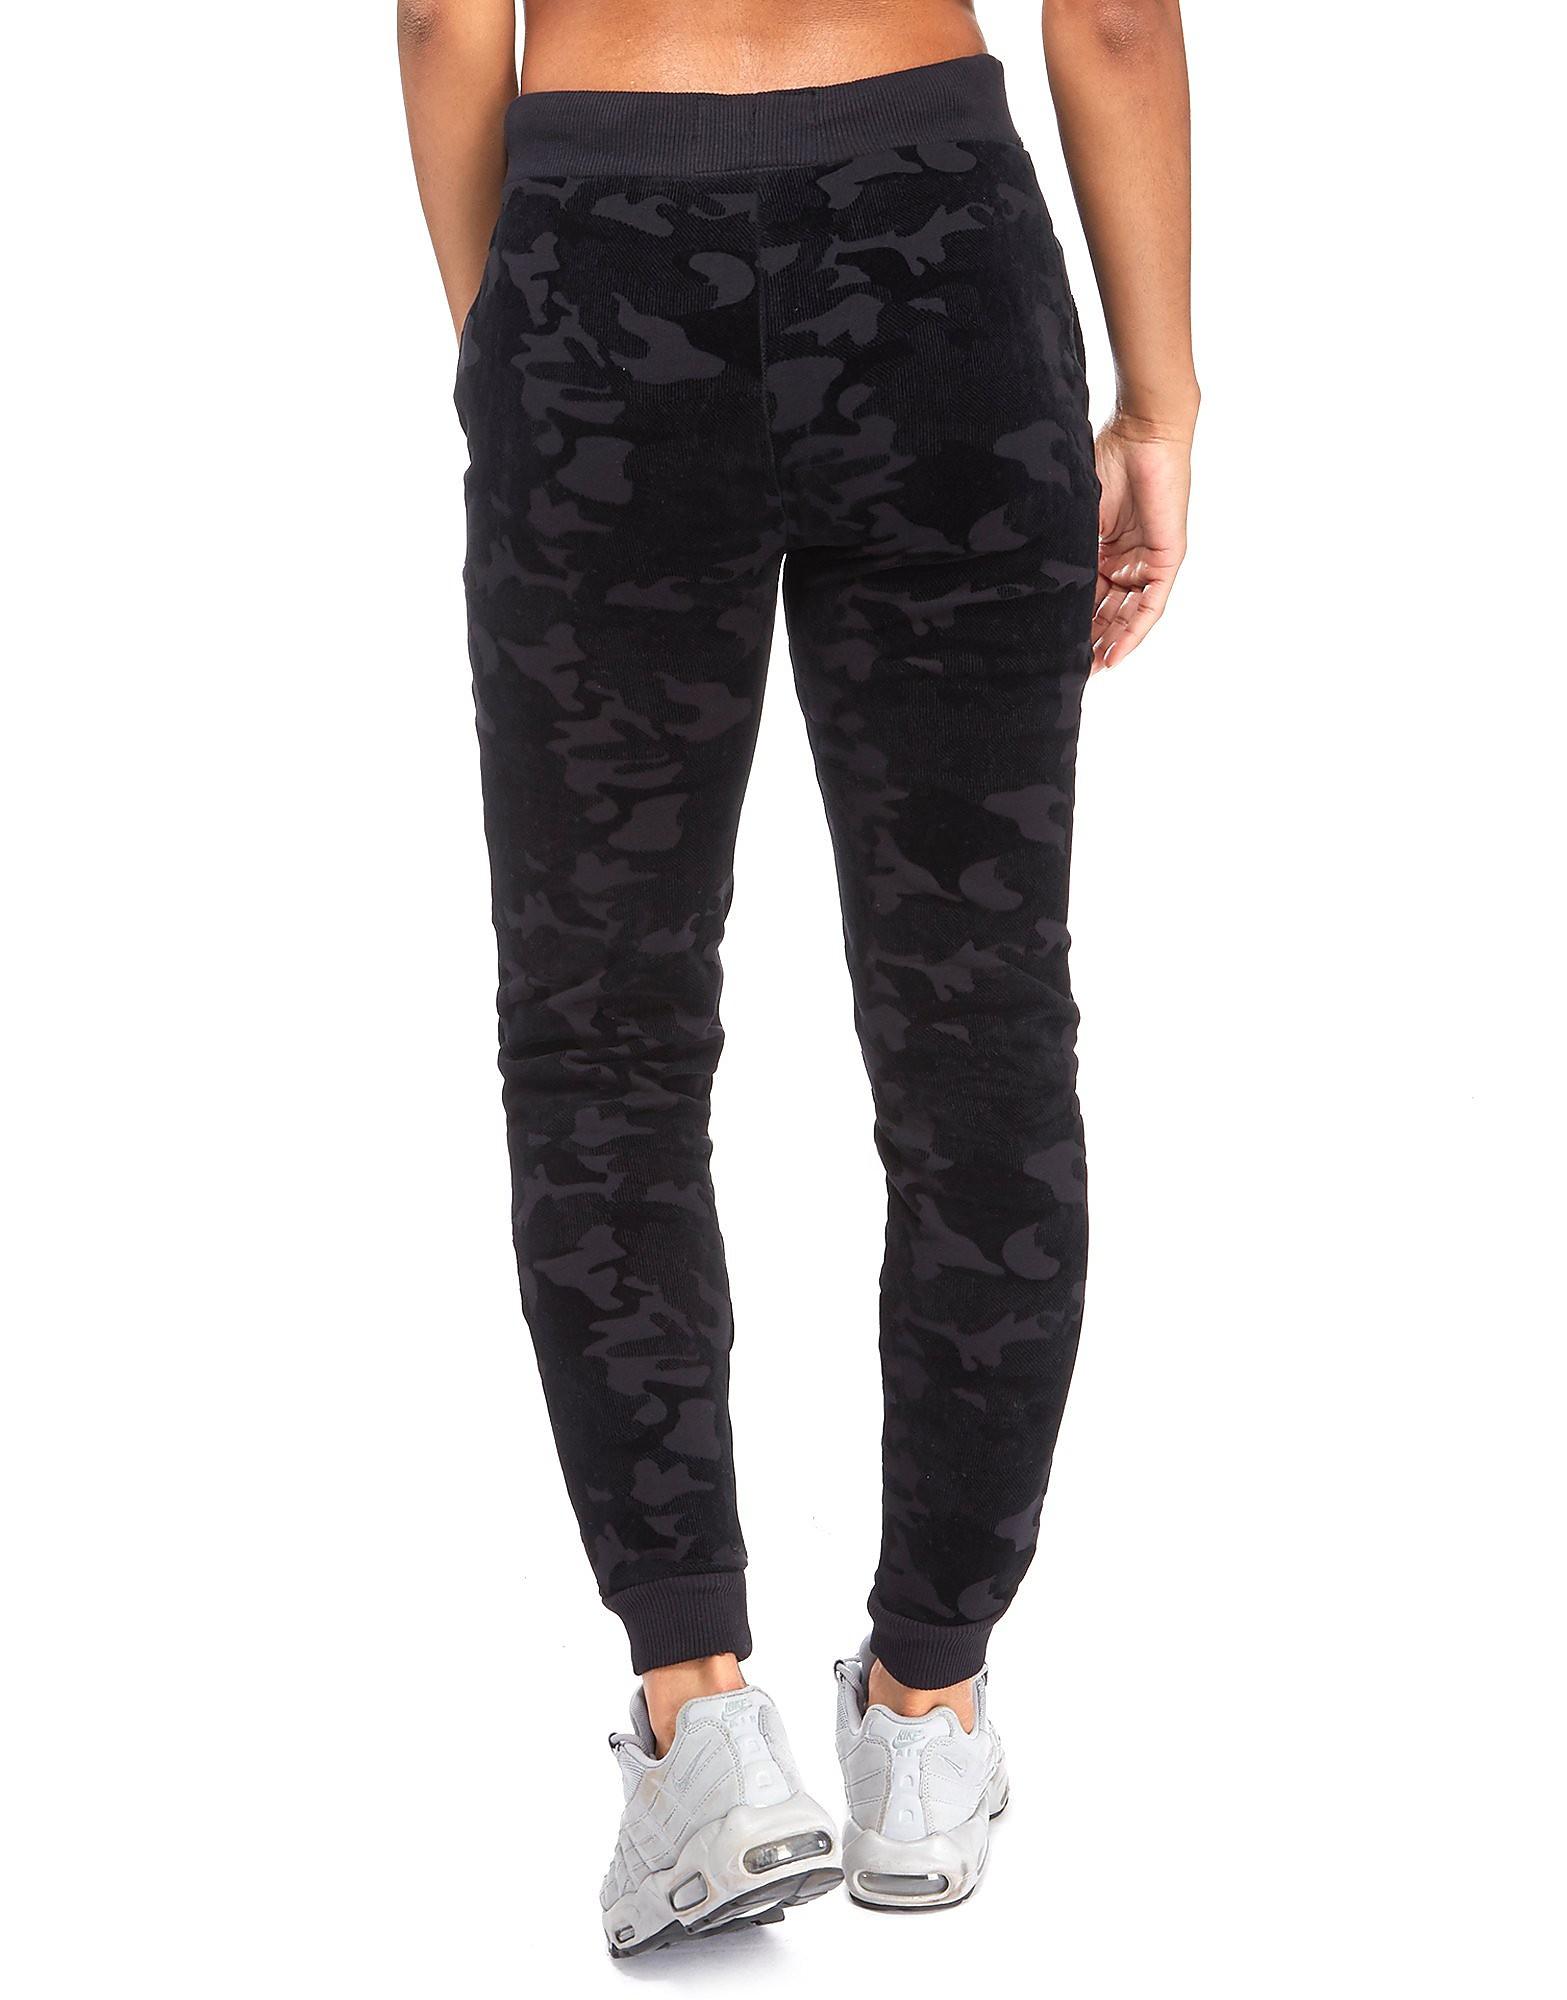 Supply & Demand Velour Camo Pantaloni Donna